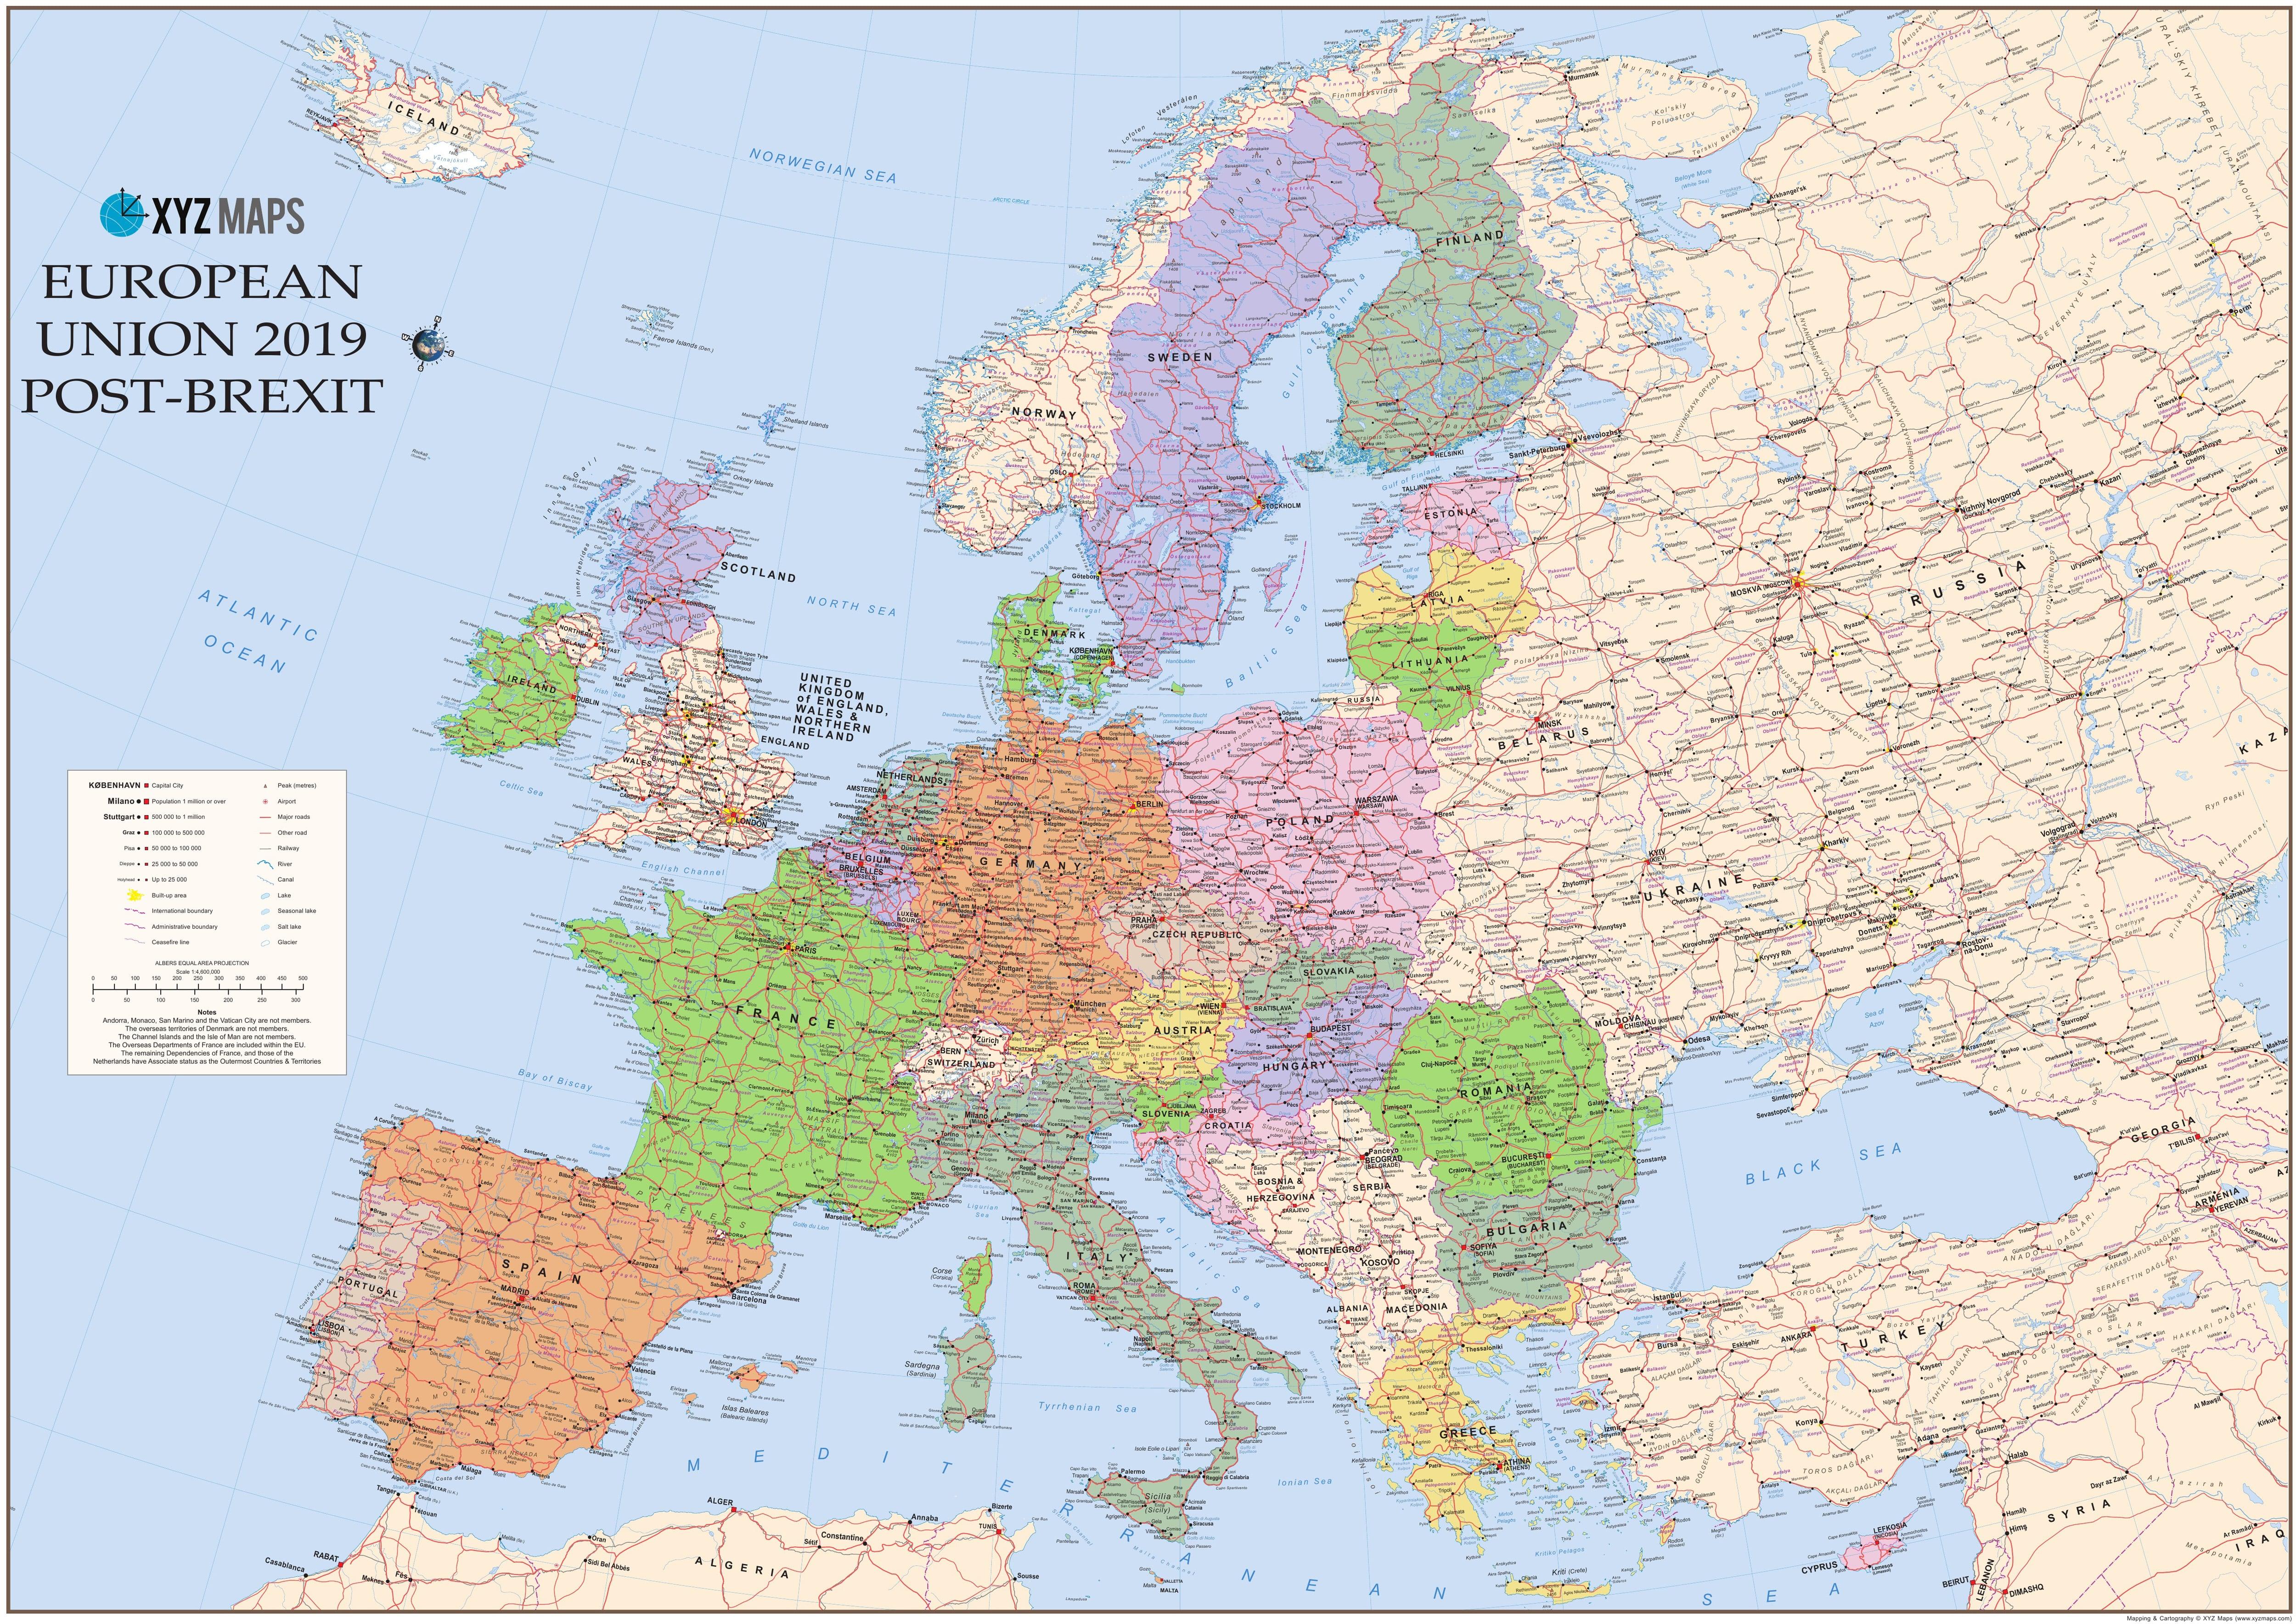 Den Europaeiske Union Eu Kort Med Skotland Som Eu Medlem 134 X